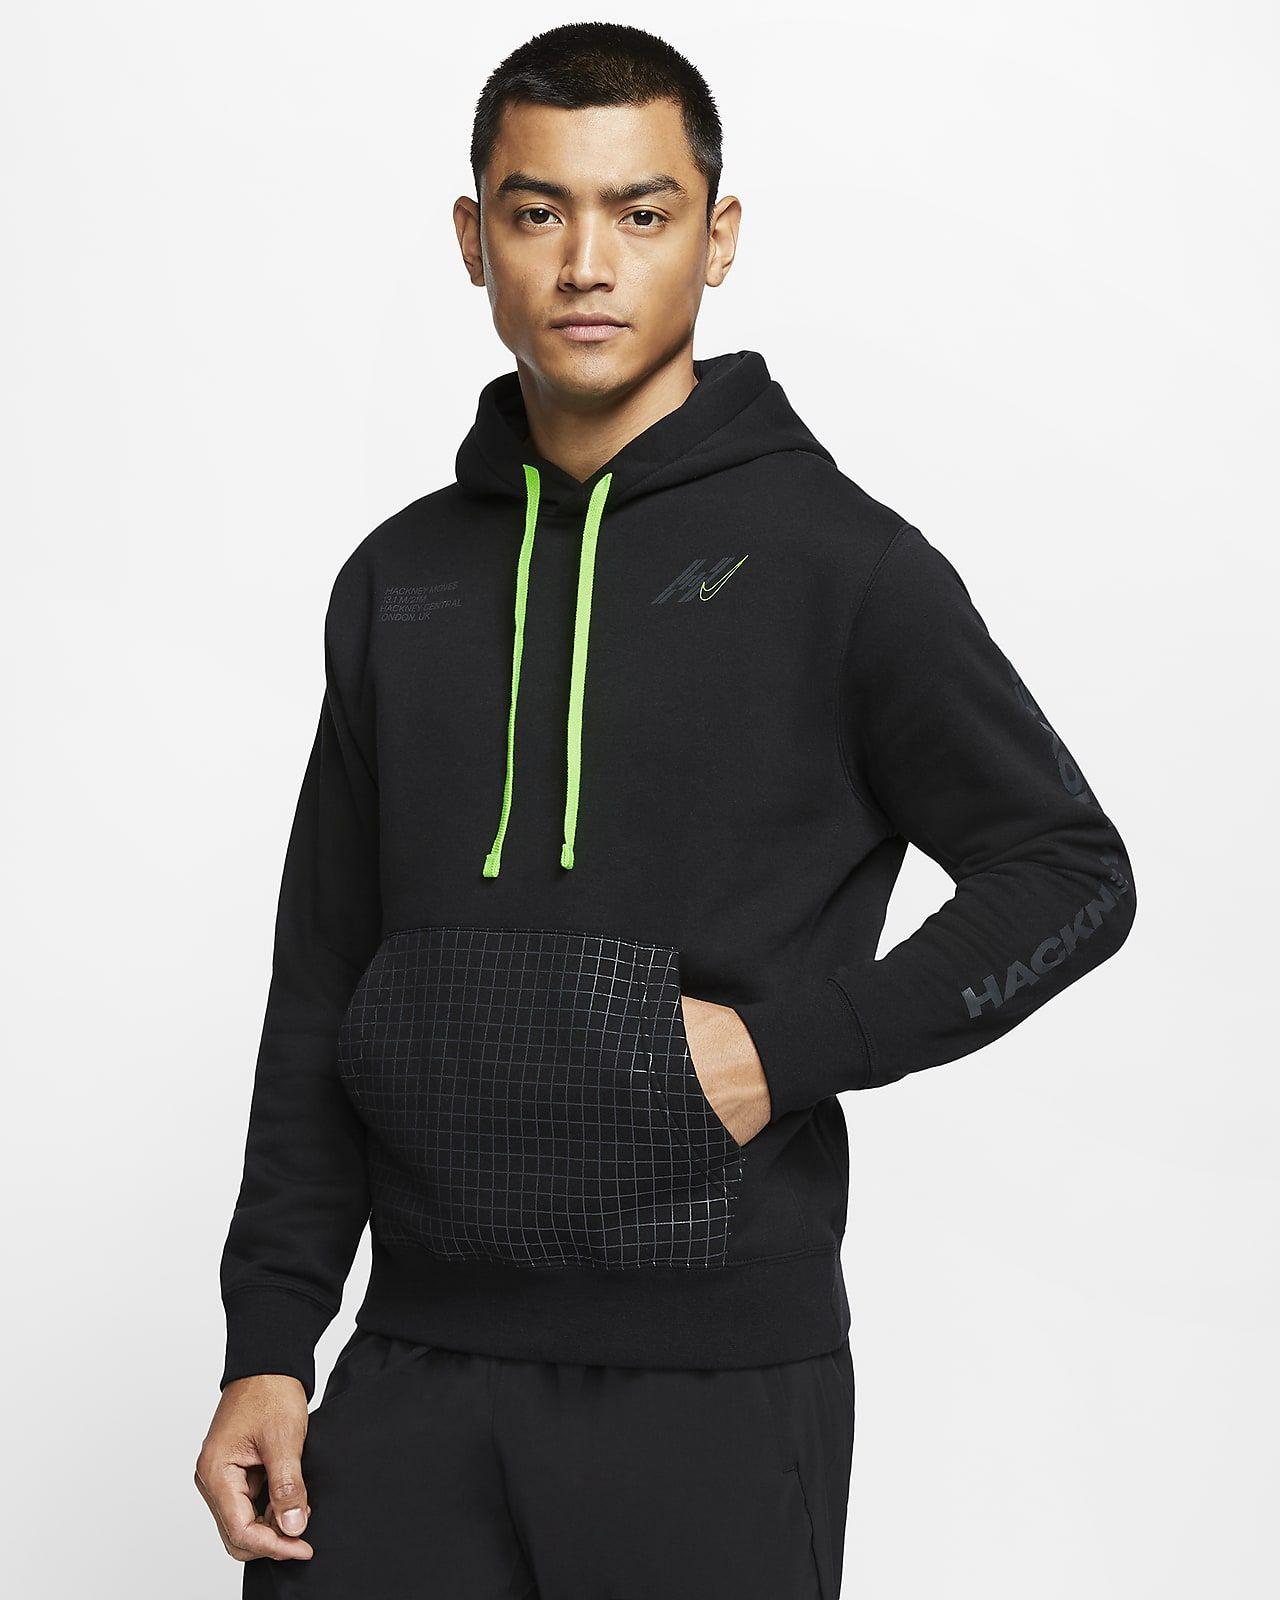 Sweat à capuche de running Nike Club Fleece - Taille XS à 2XL